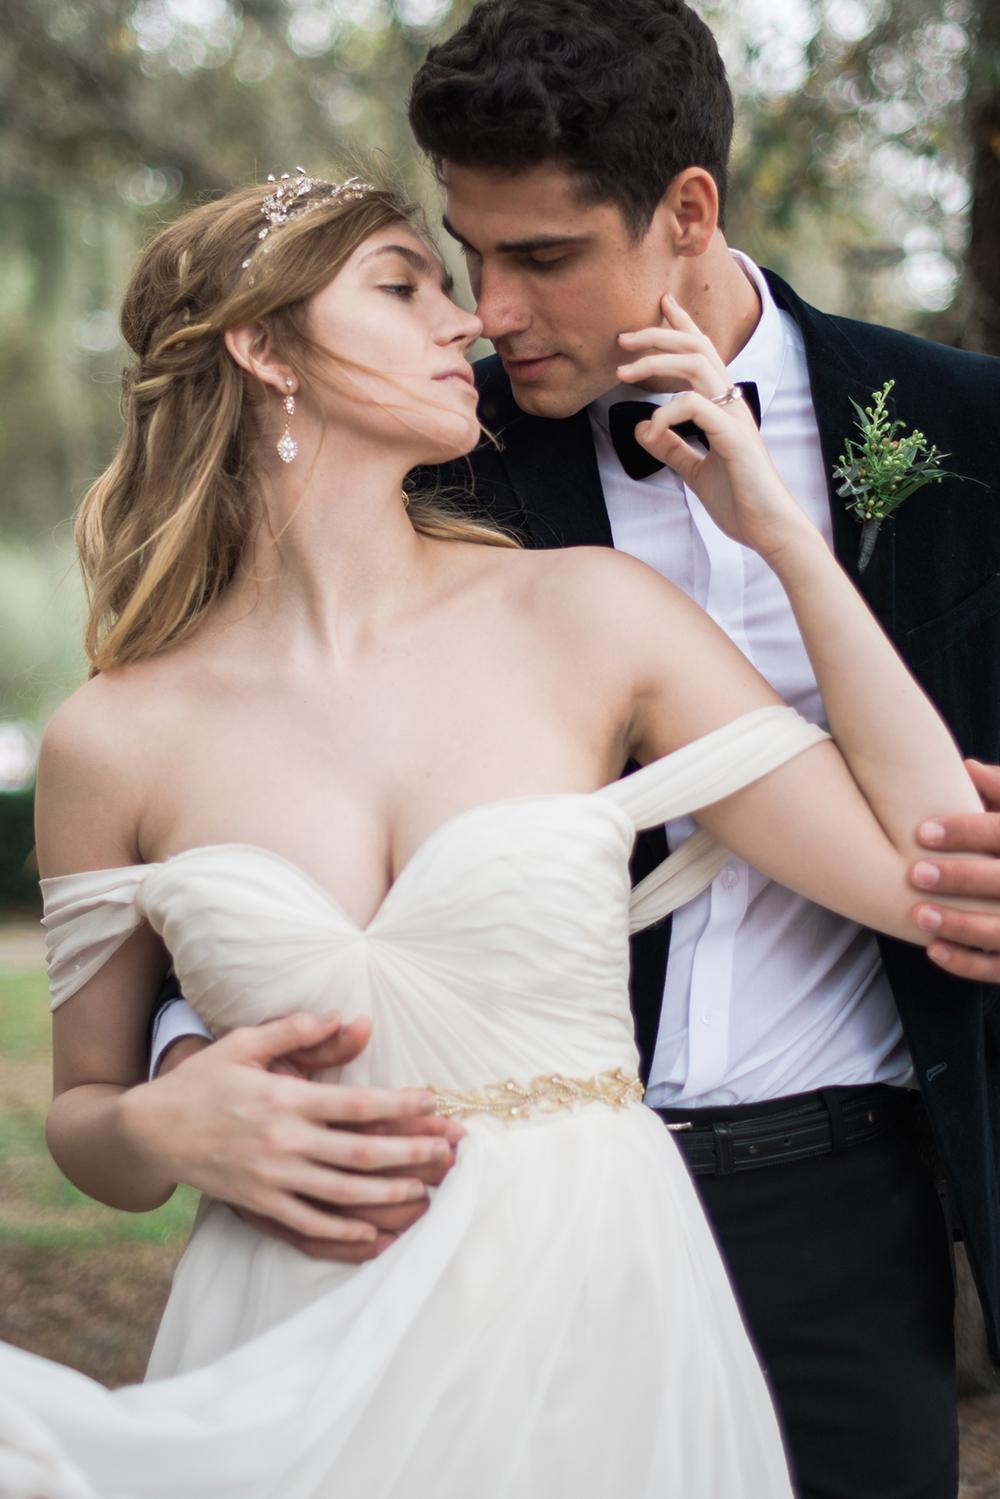 romantic wedding dresses - photo by Kristen Weaver Photography http://ruffledblog.com/modern-organic-wedding-inspiration-with-greenery